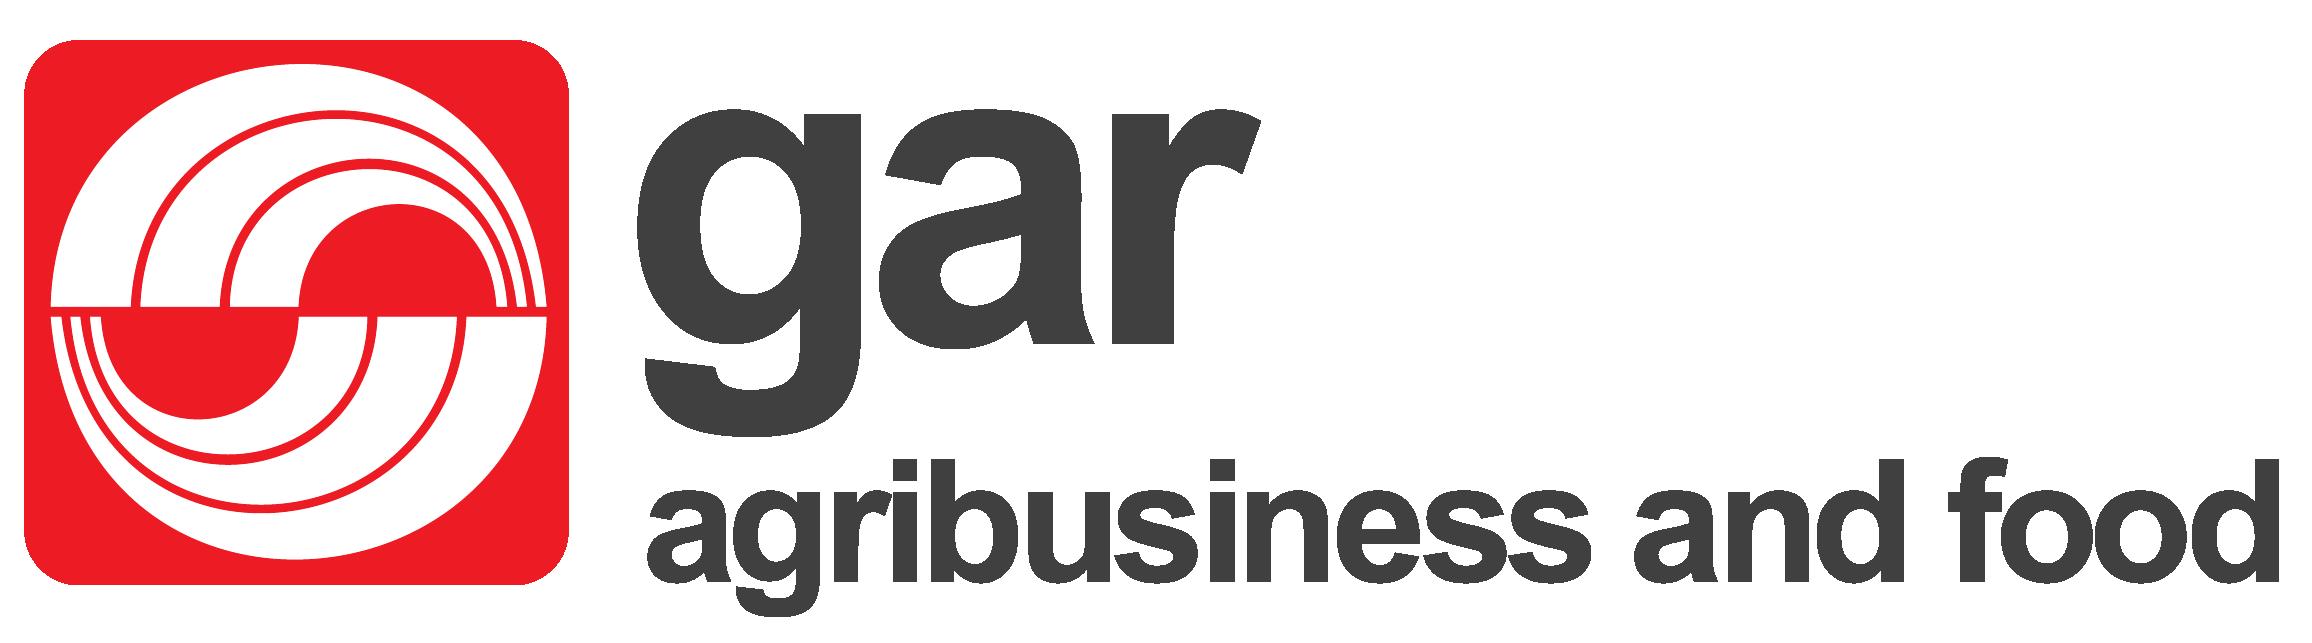 Image gar agribusiness and food logo  rgb  01   correct